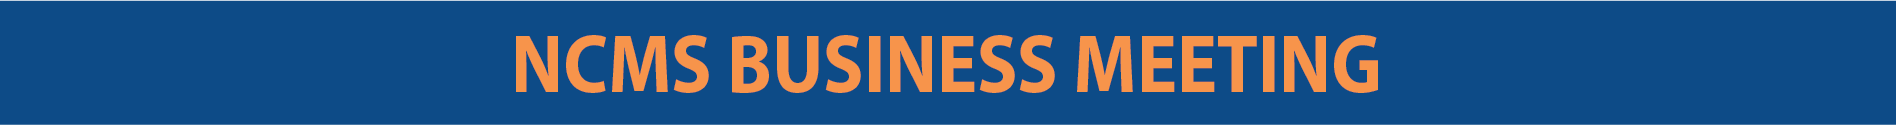 NCMS BUSINESS